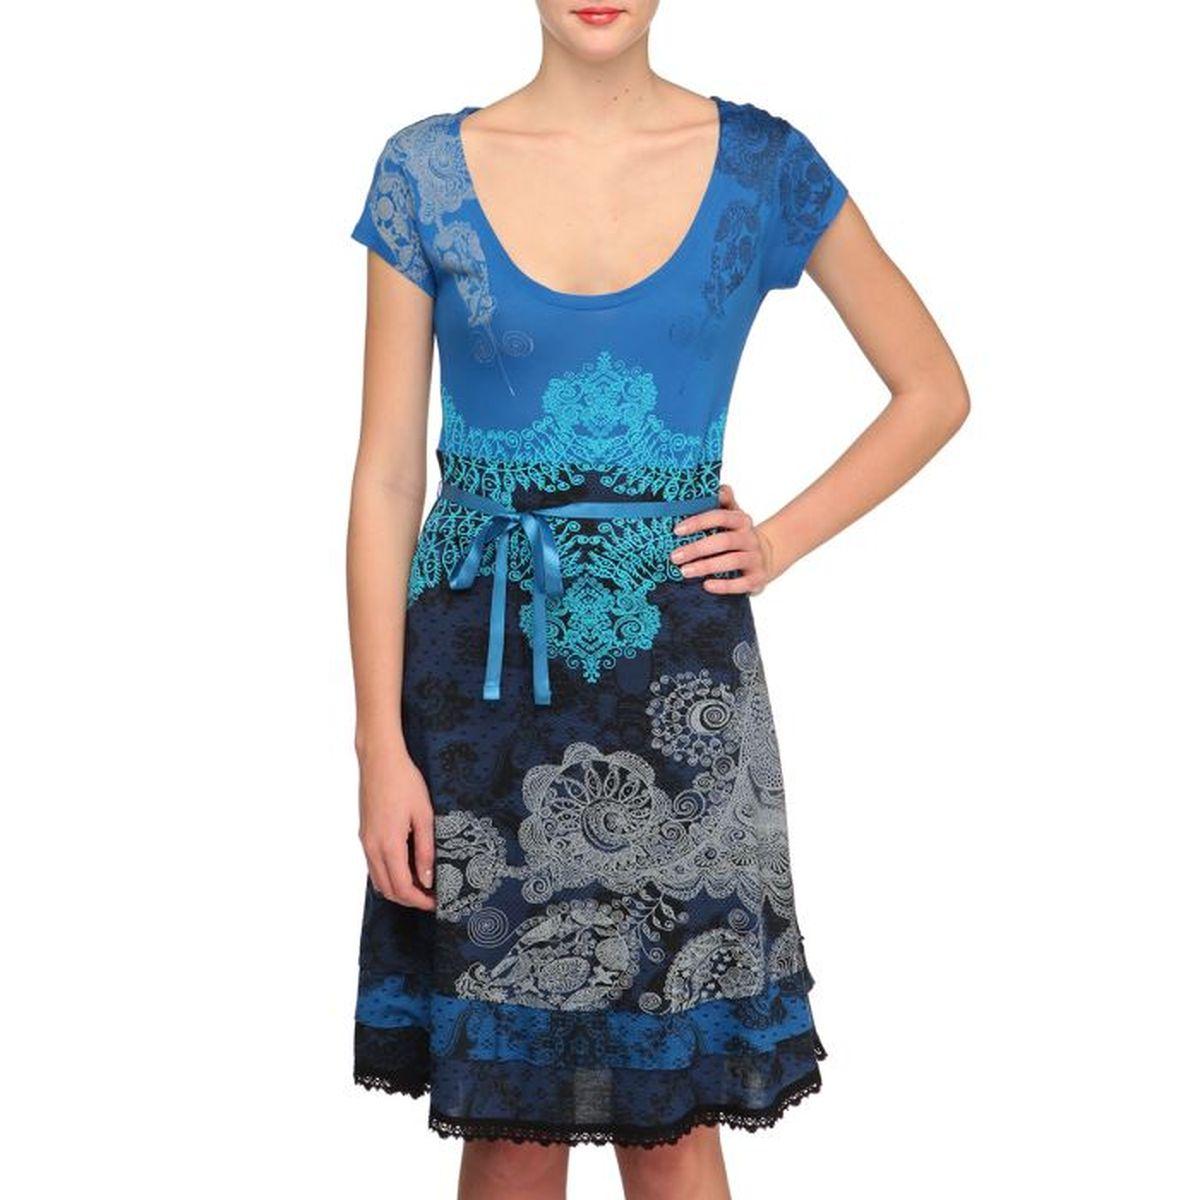 Desigual Robe Paris Femme Bleu Achat Vente Robe Cdiscount